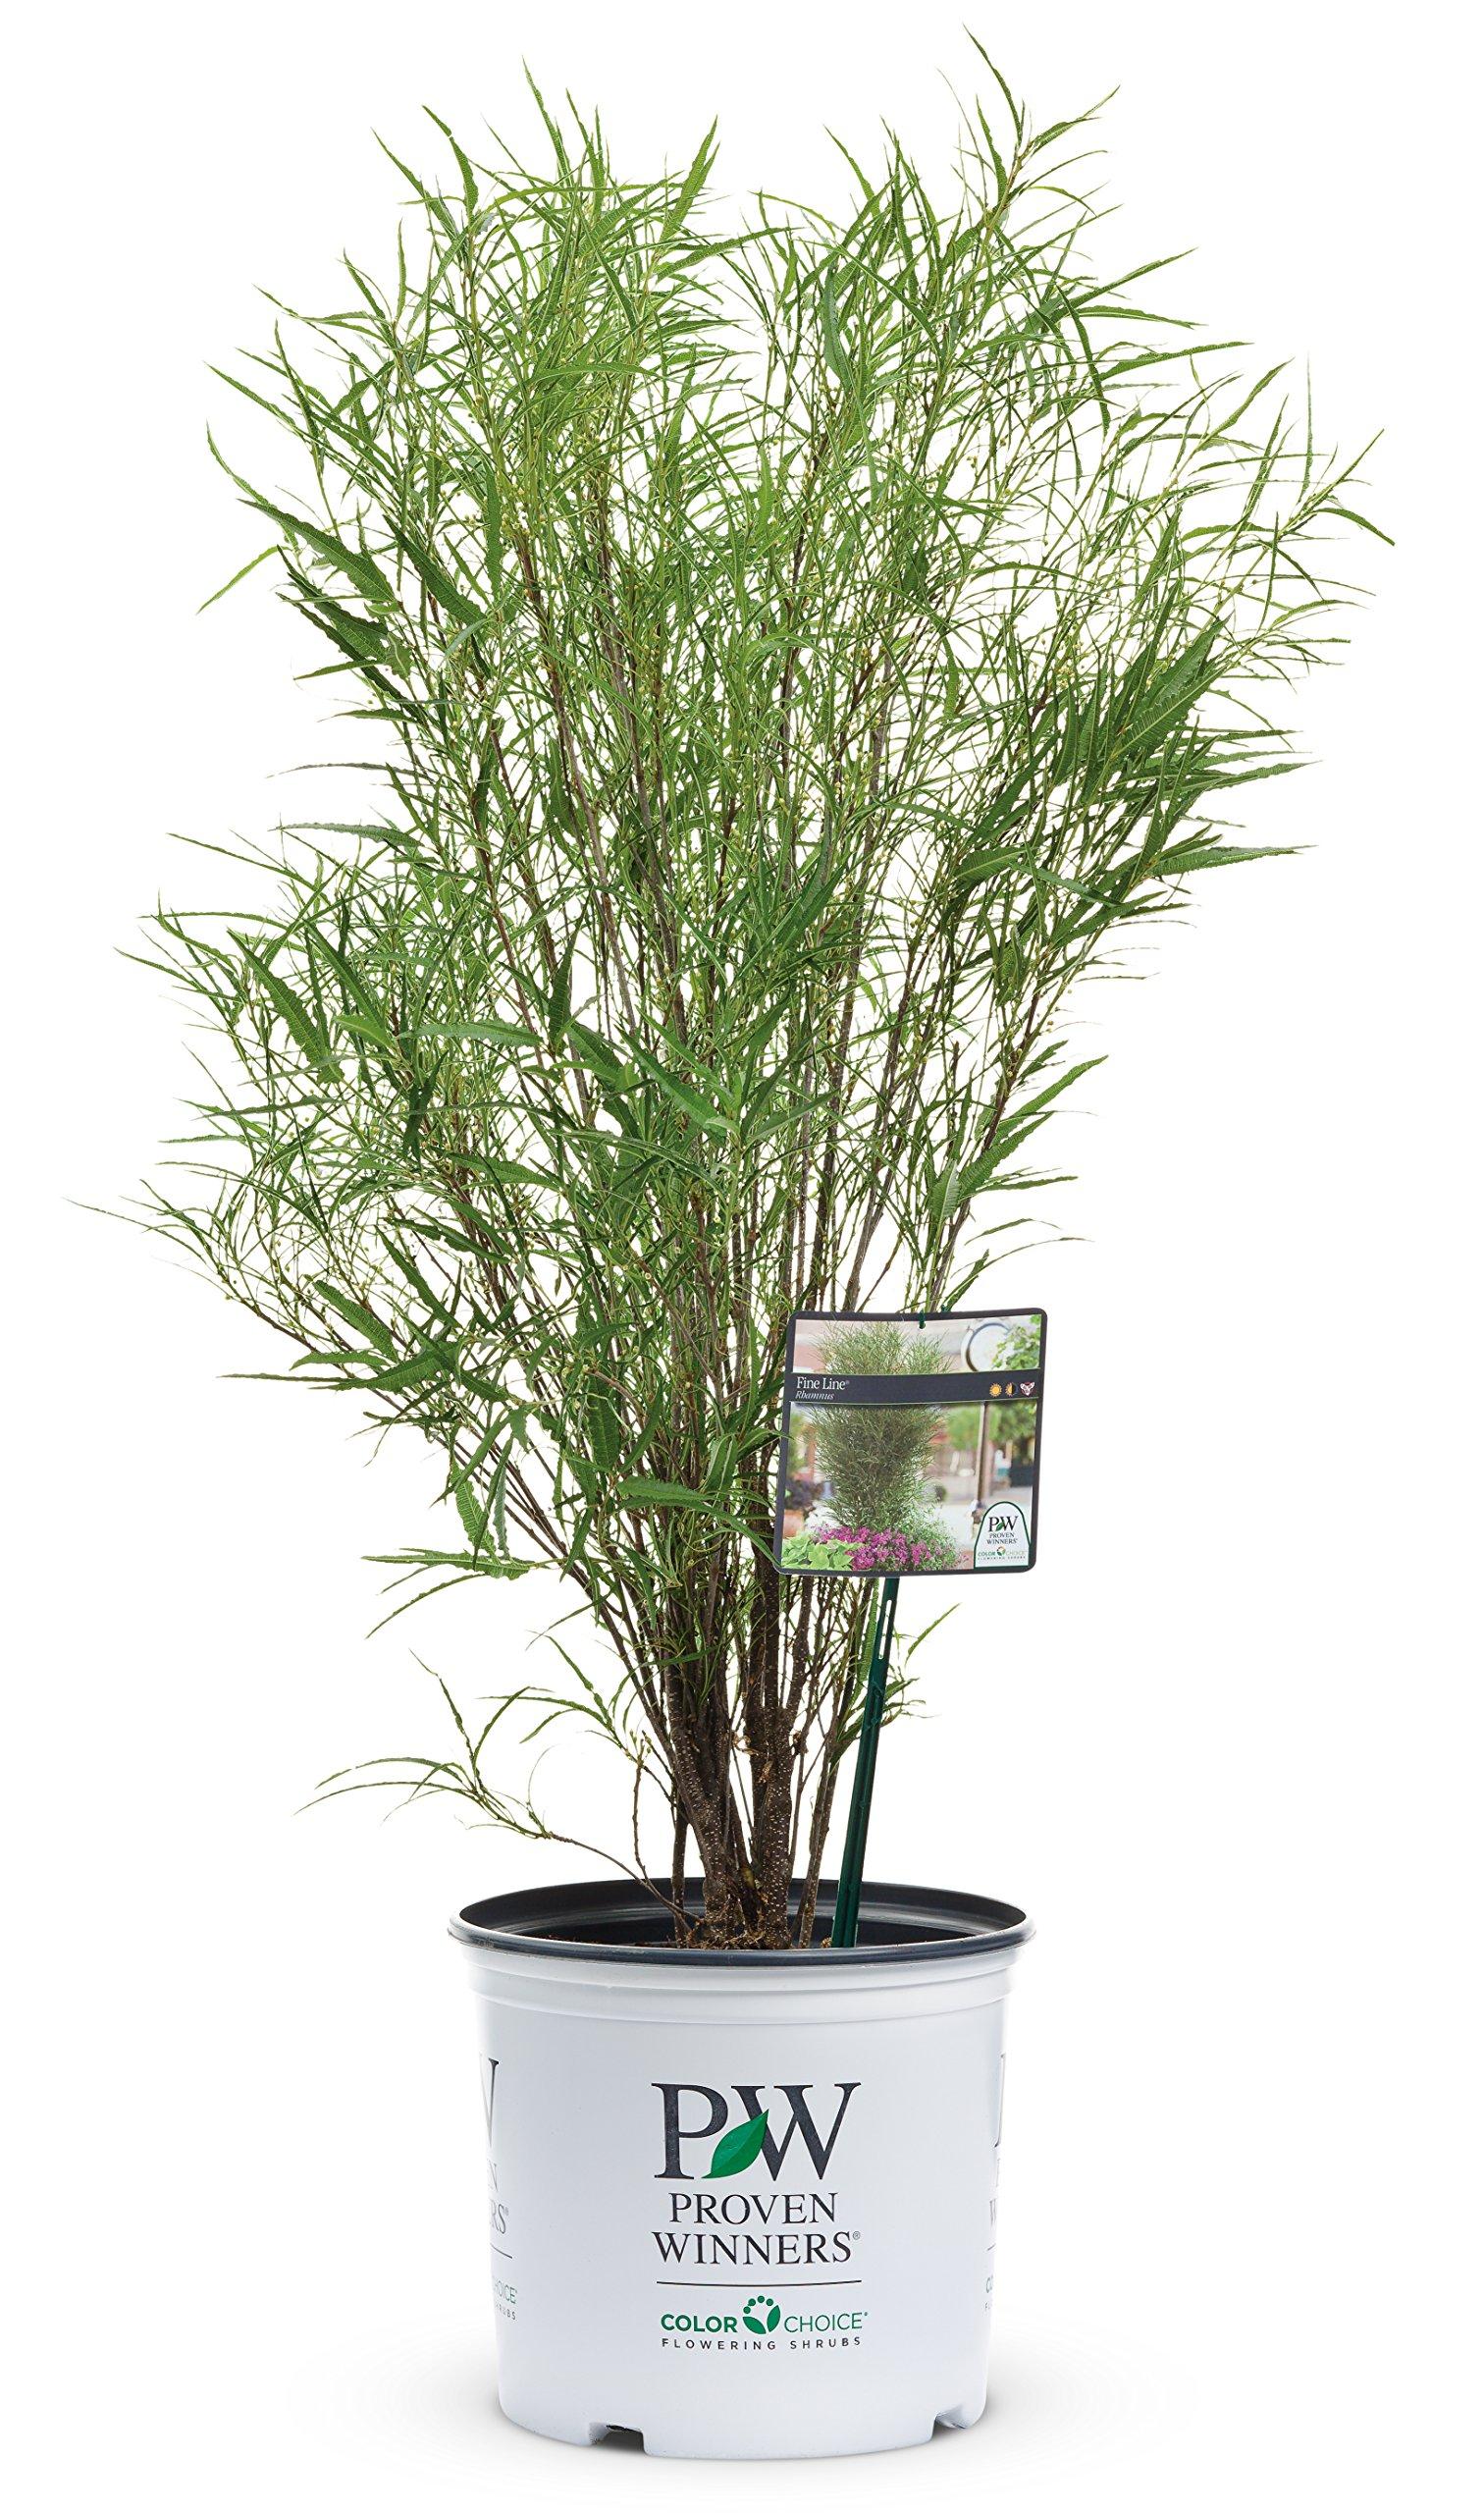 Fine Line Buckthorn (Rhamnus) Live Shrub, Green Foliage, 1 Gallon